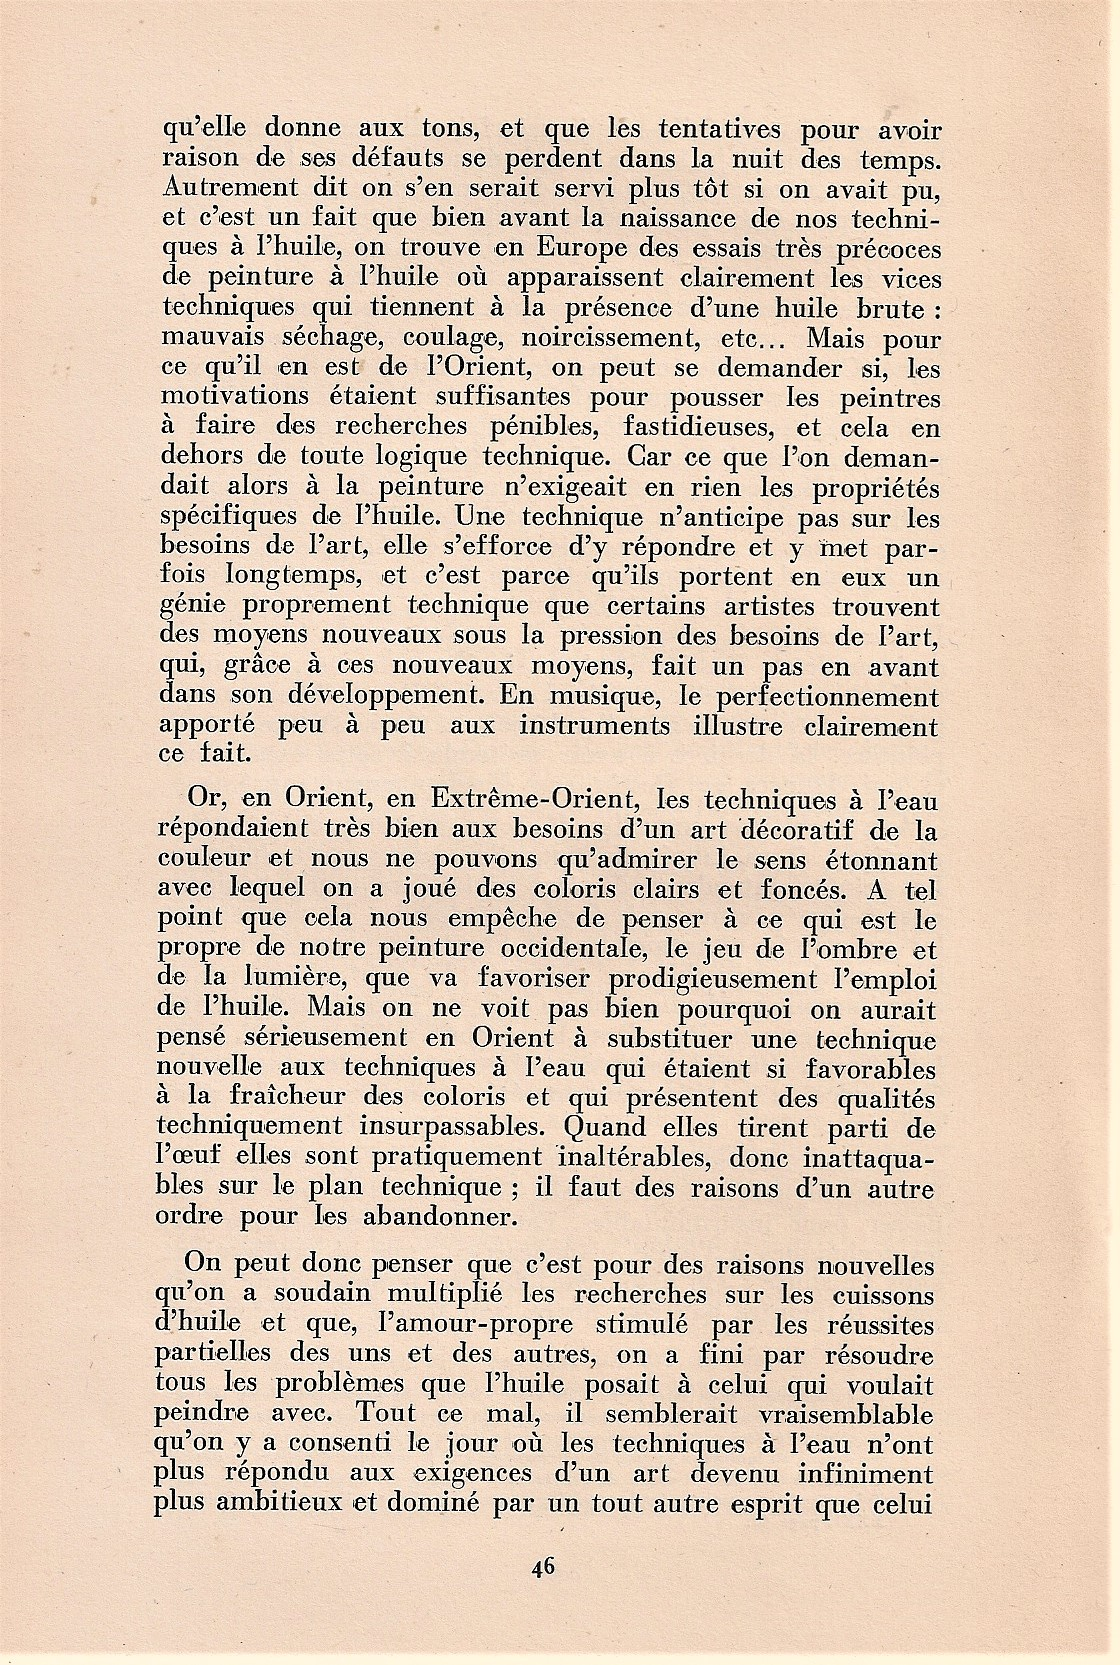 versini-page-46.jpg